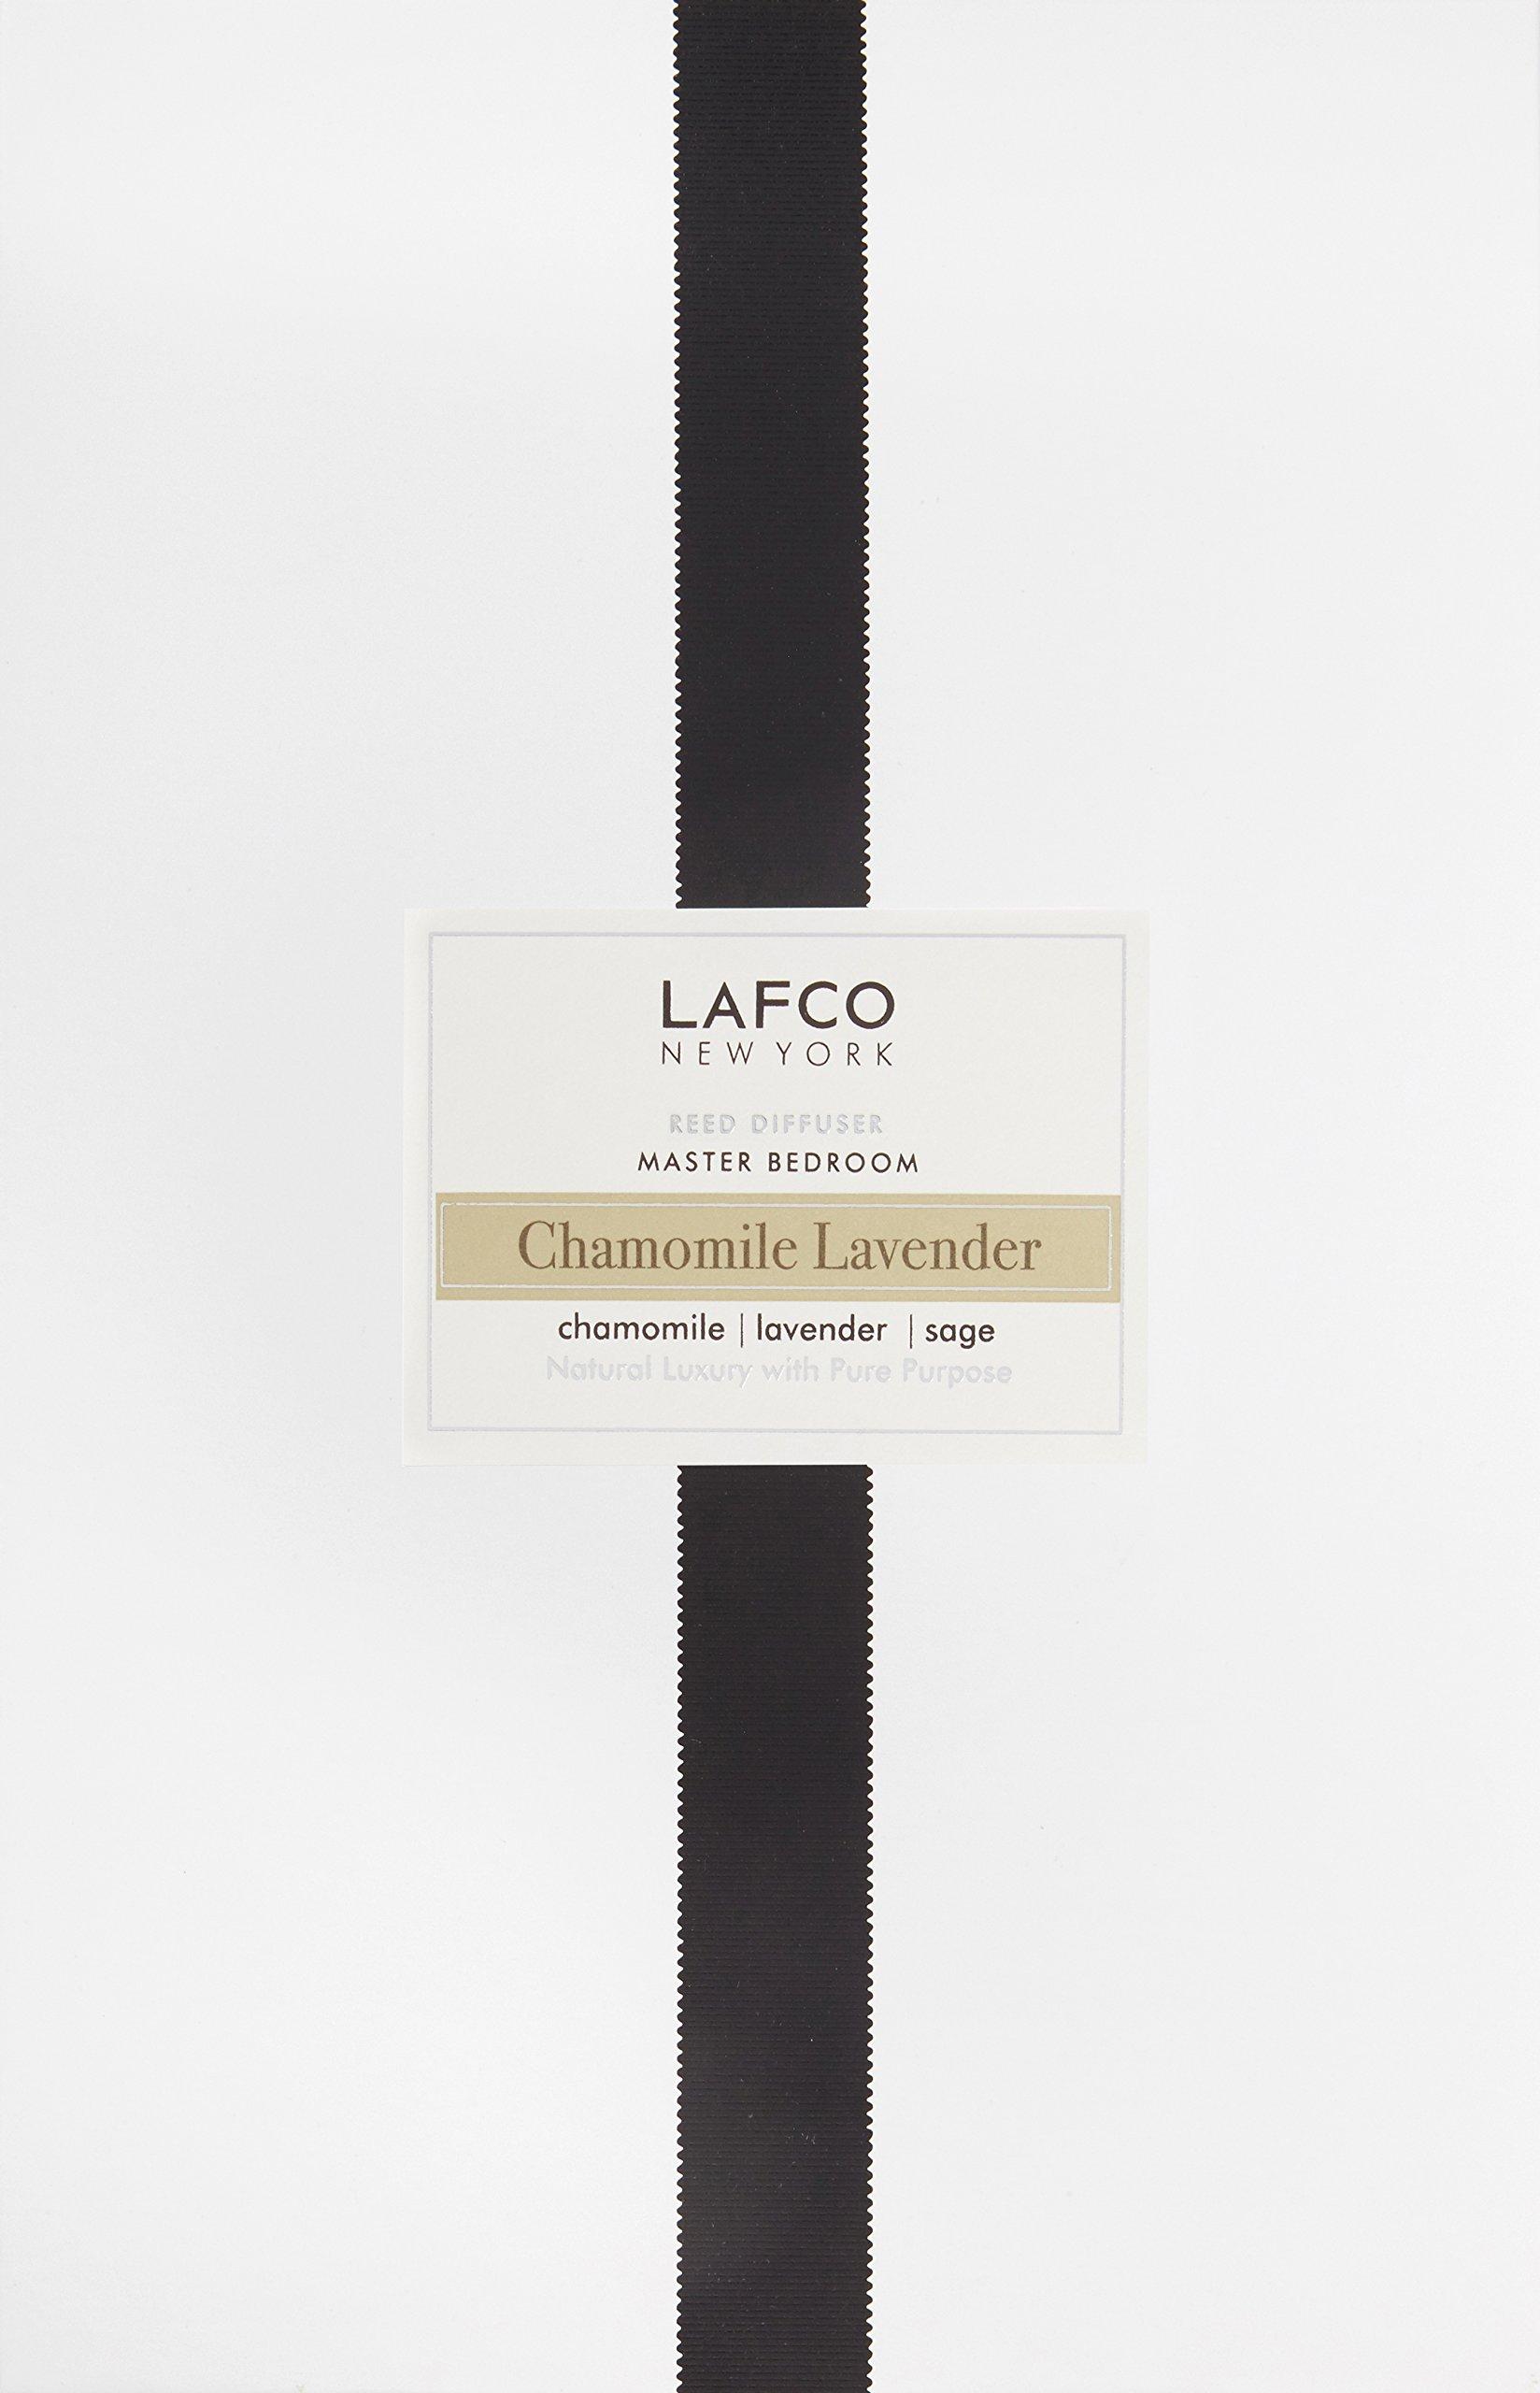 LAFCO House & Home Diffuser, Bedroom Chamomile Lavender, 15 Fl Oz by LAFCO (Image #3)